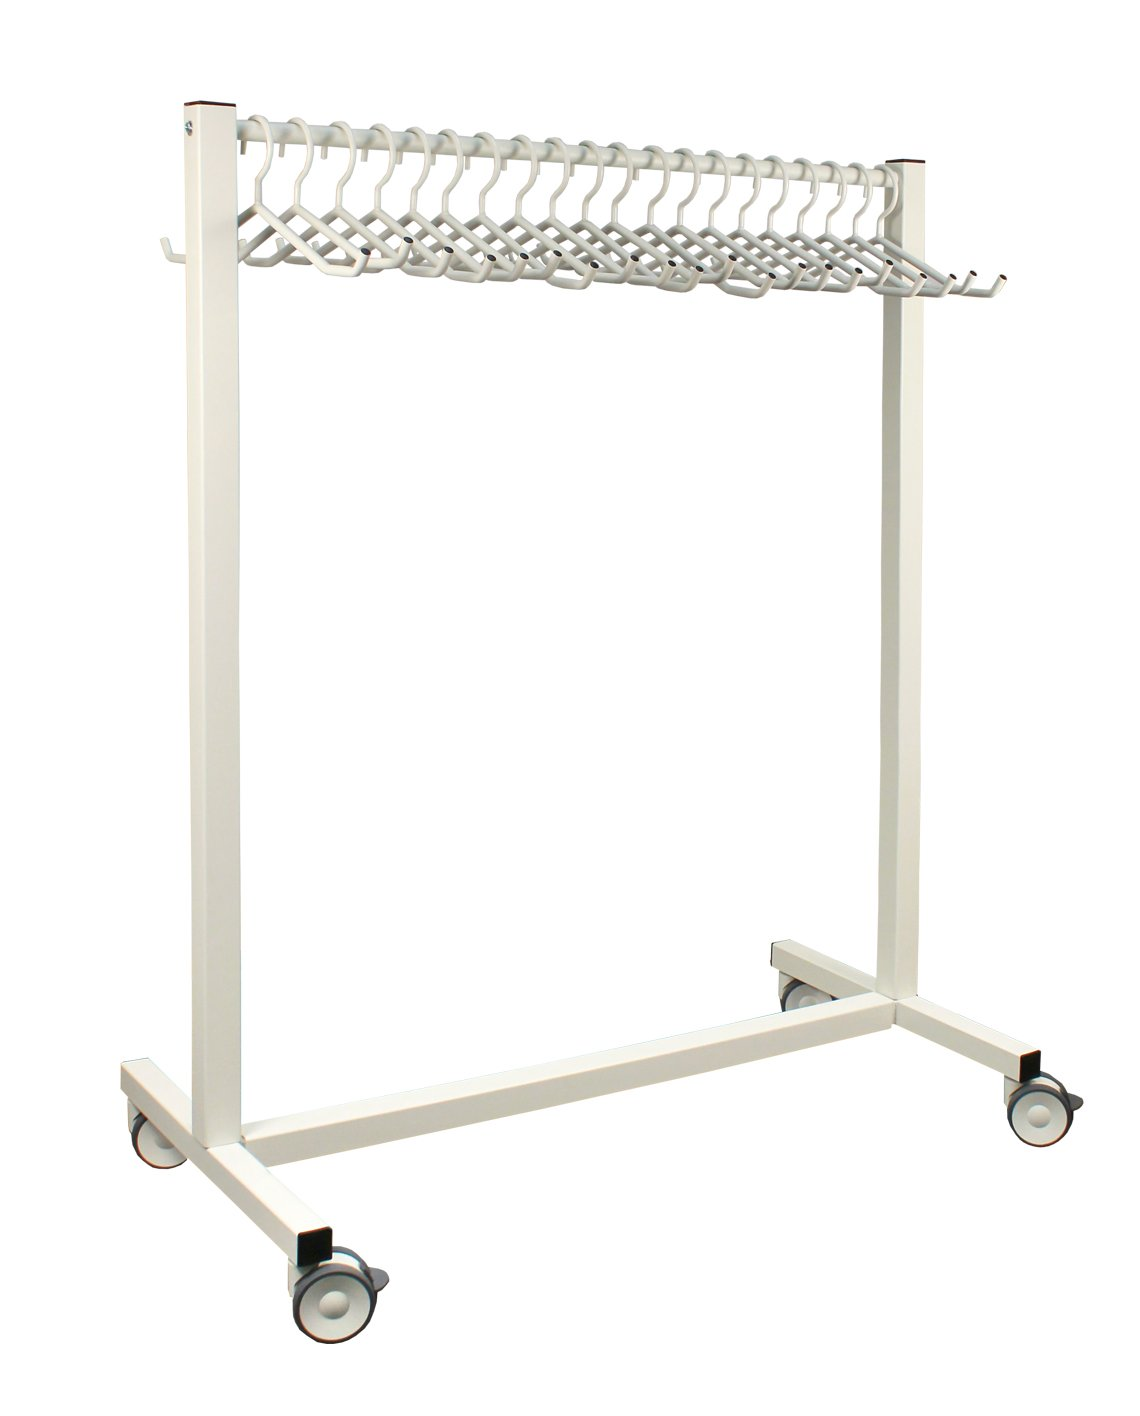 20 hanger mobile apron rack